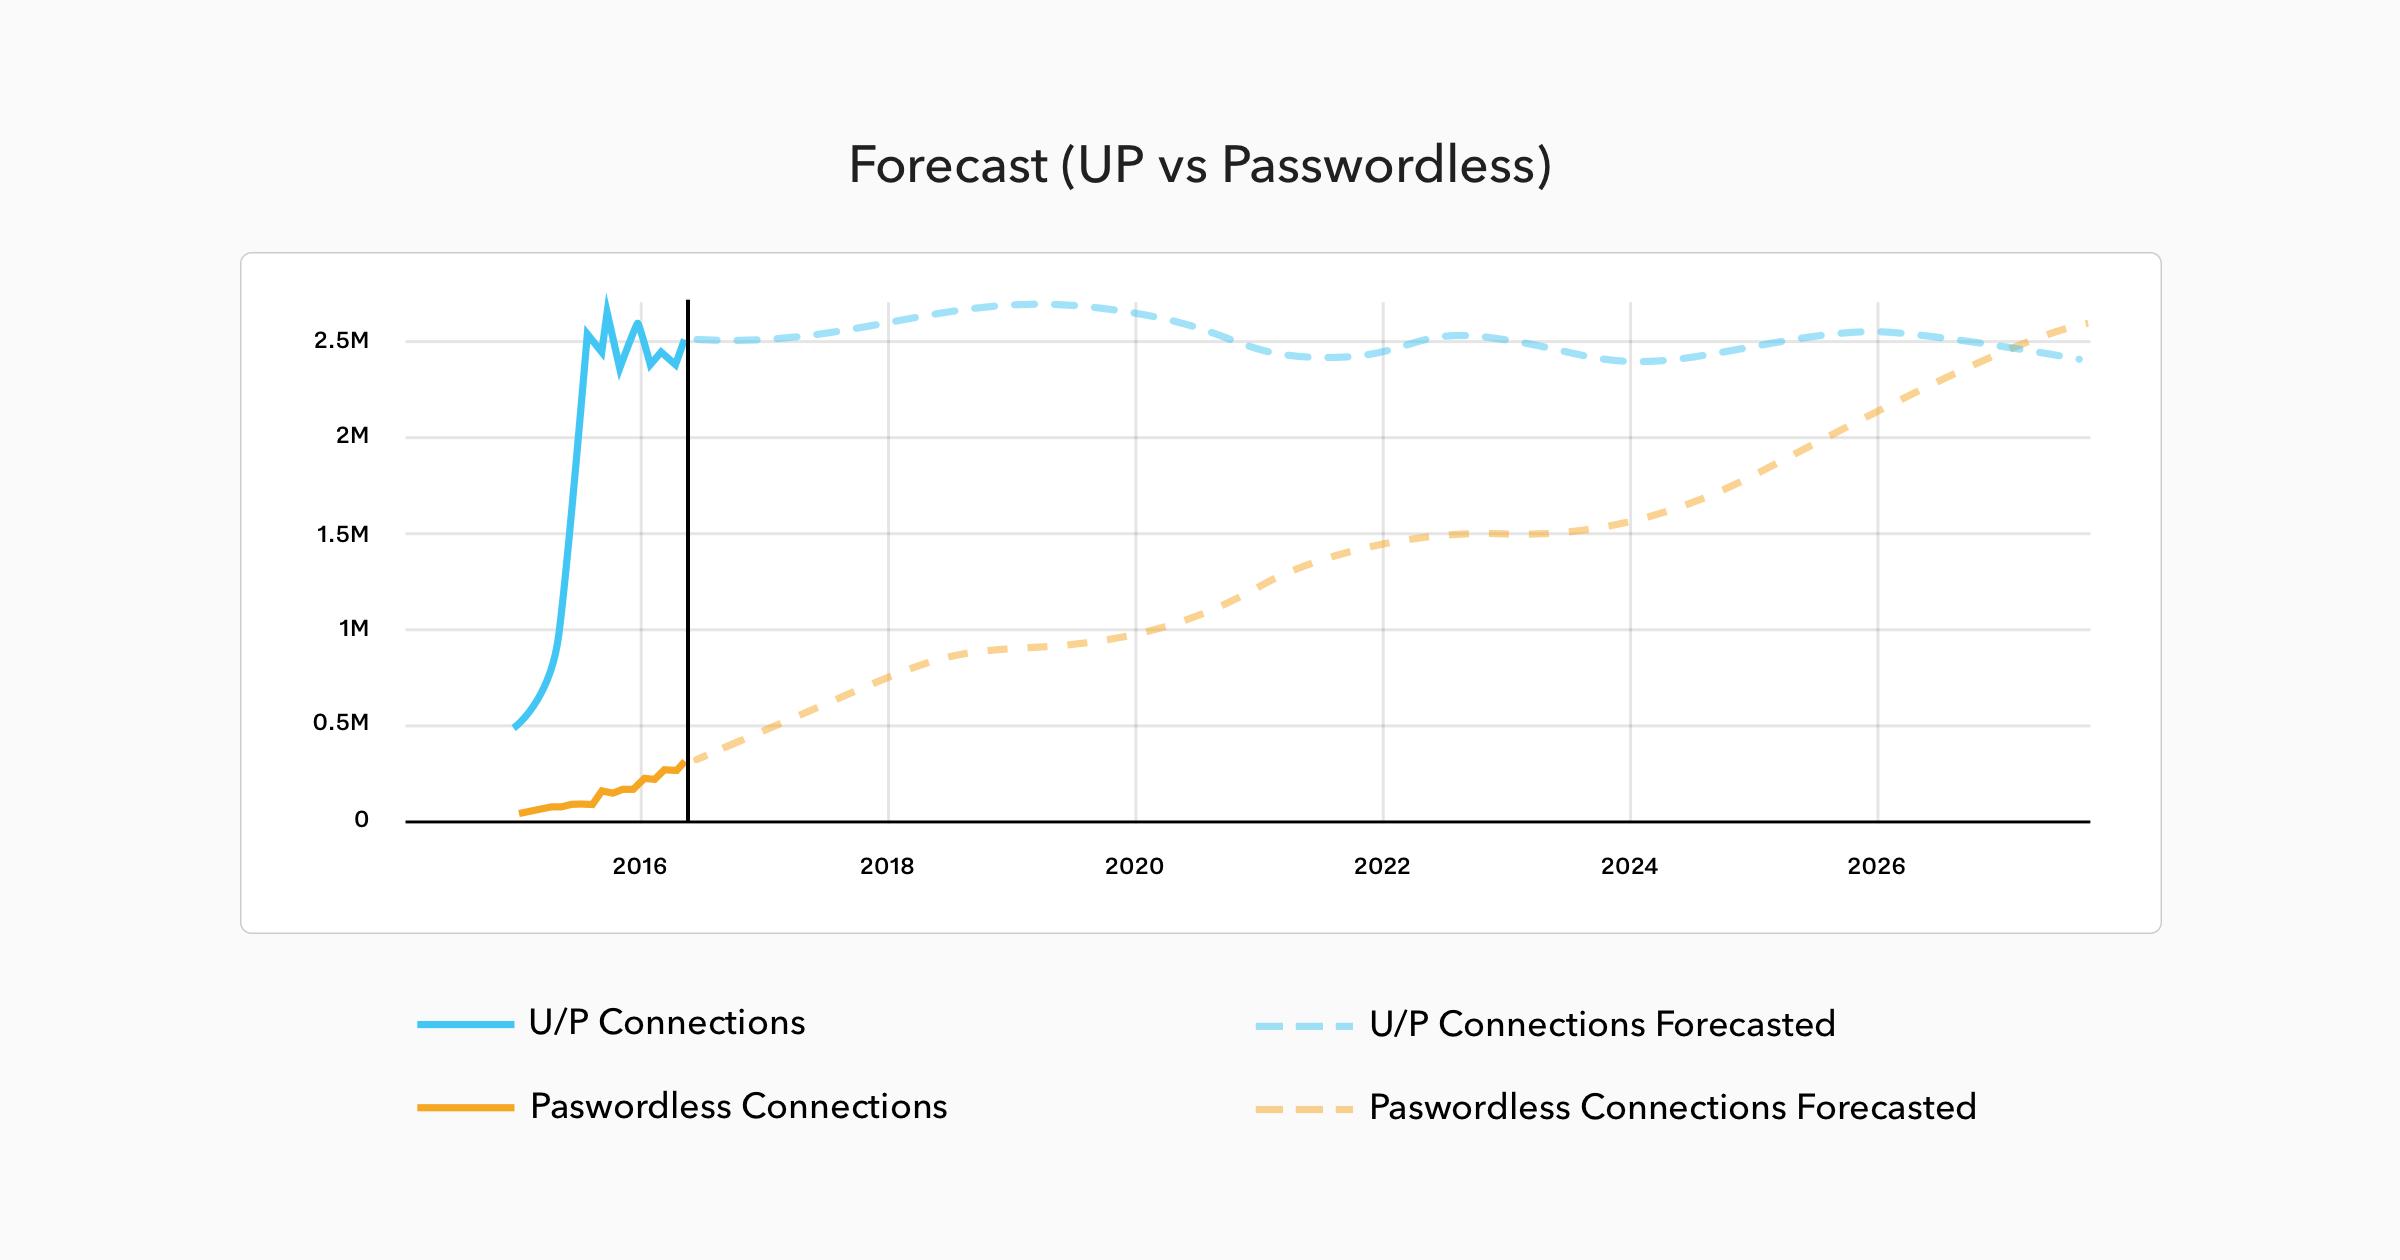 Forecast vs Passwordless